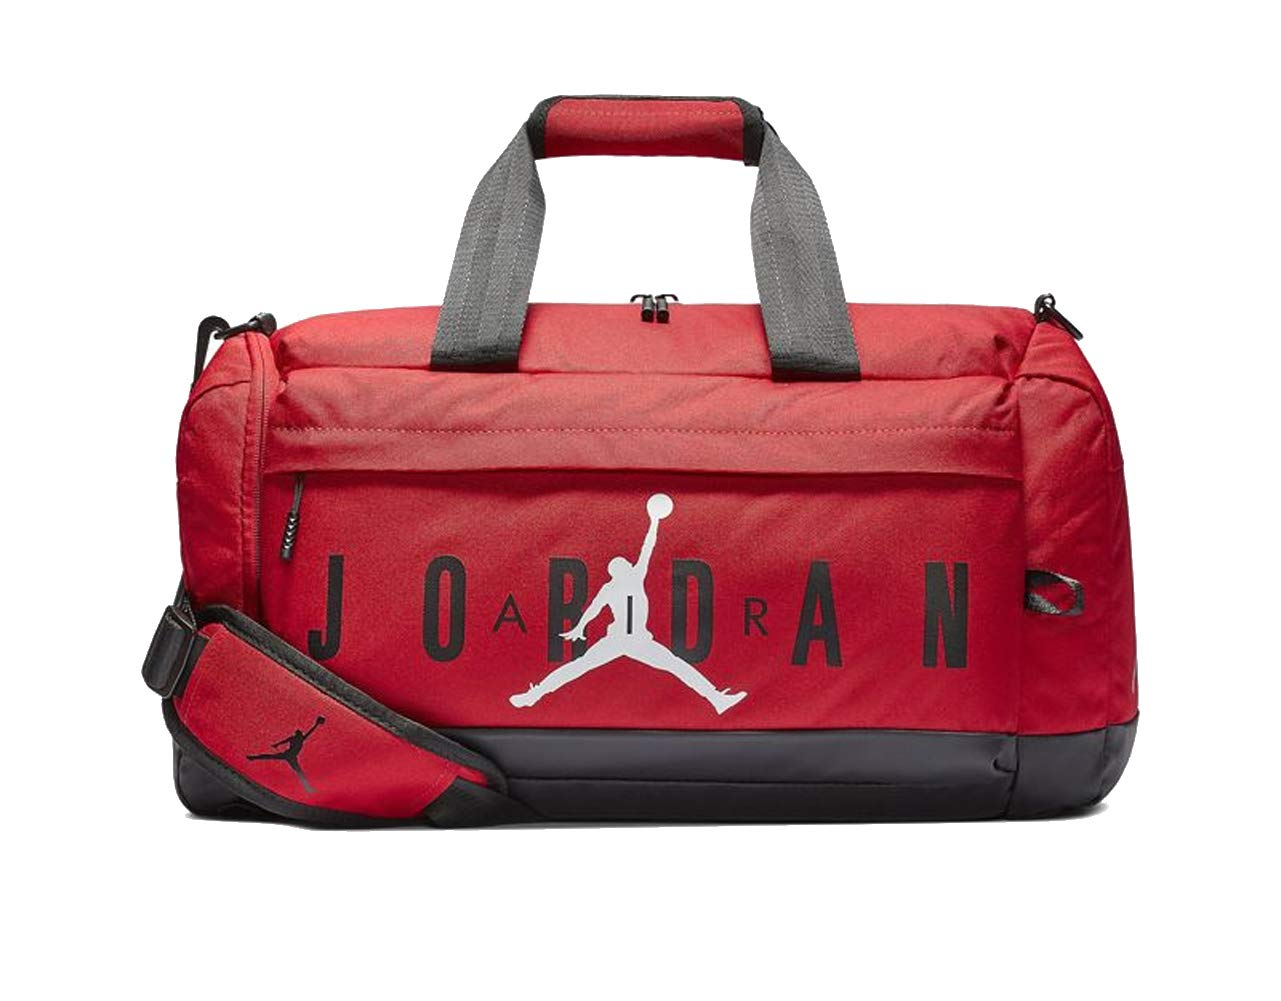 Nike Air Jordan Velocity Duffle Bag (One Size, Gym Red) by Nike